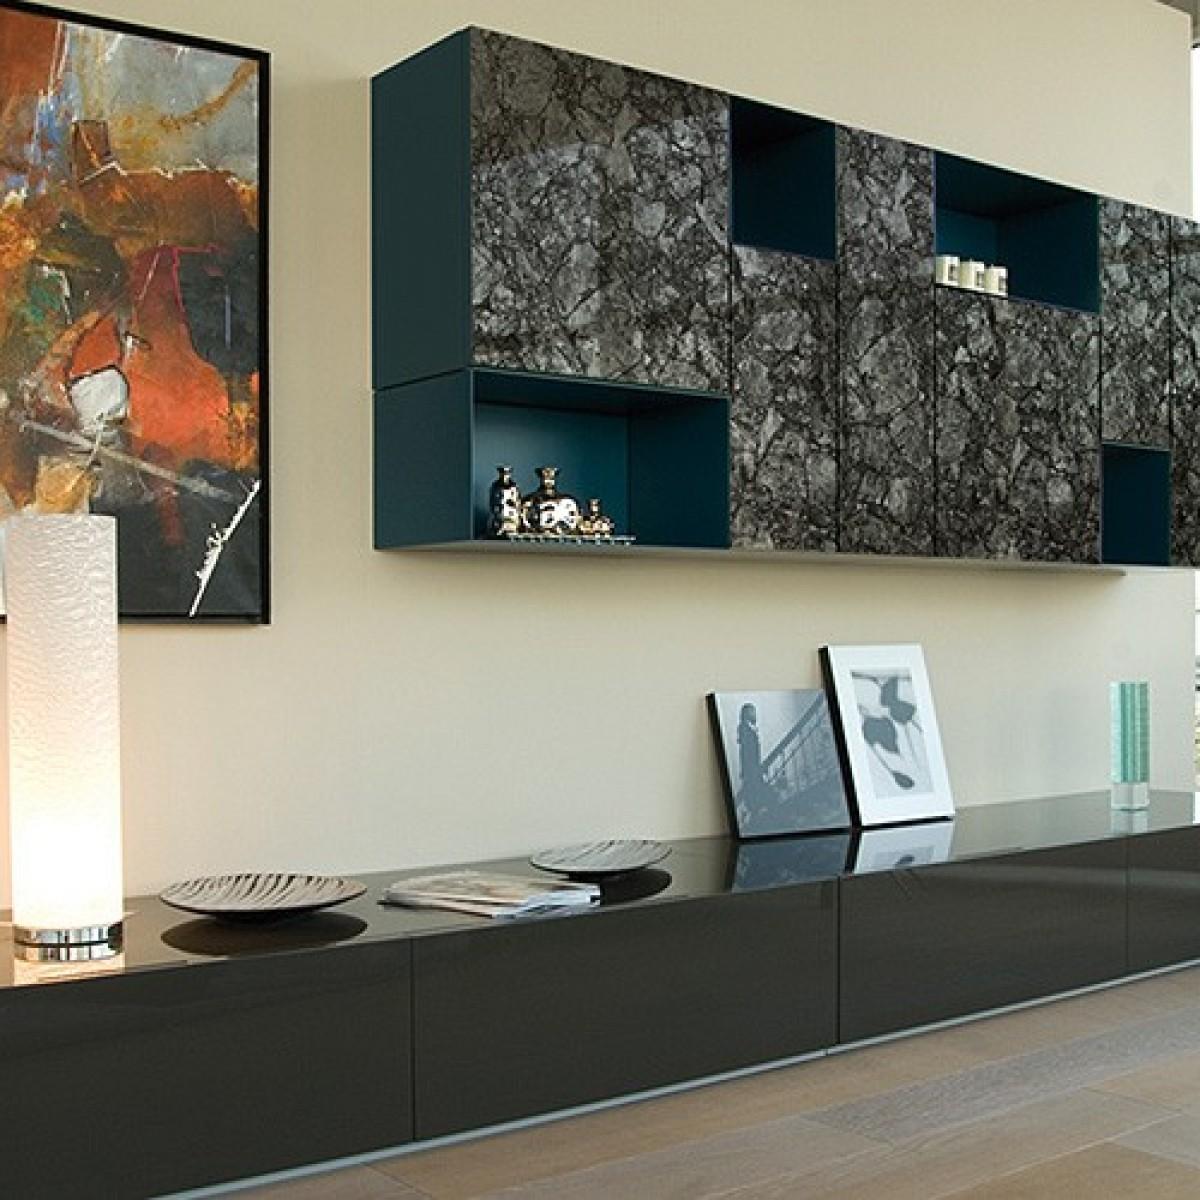 Panou decorativ S-GLASS 17013-AR, WallFace, autocolant